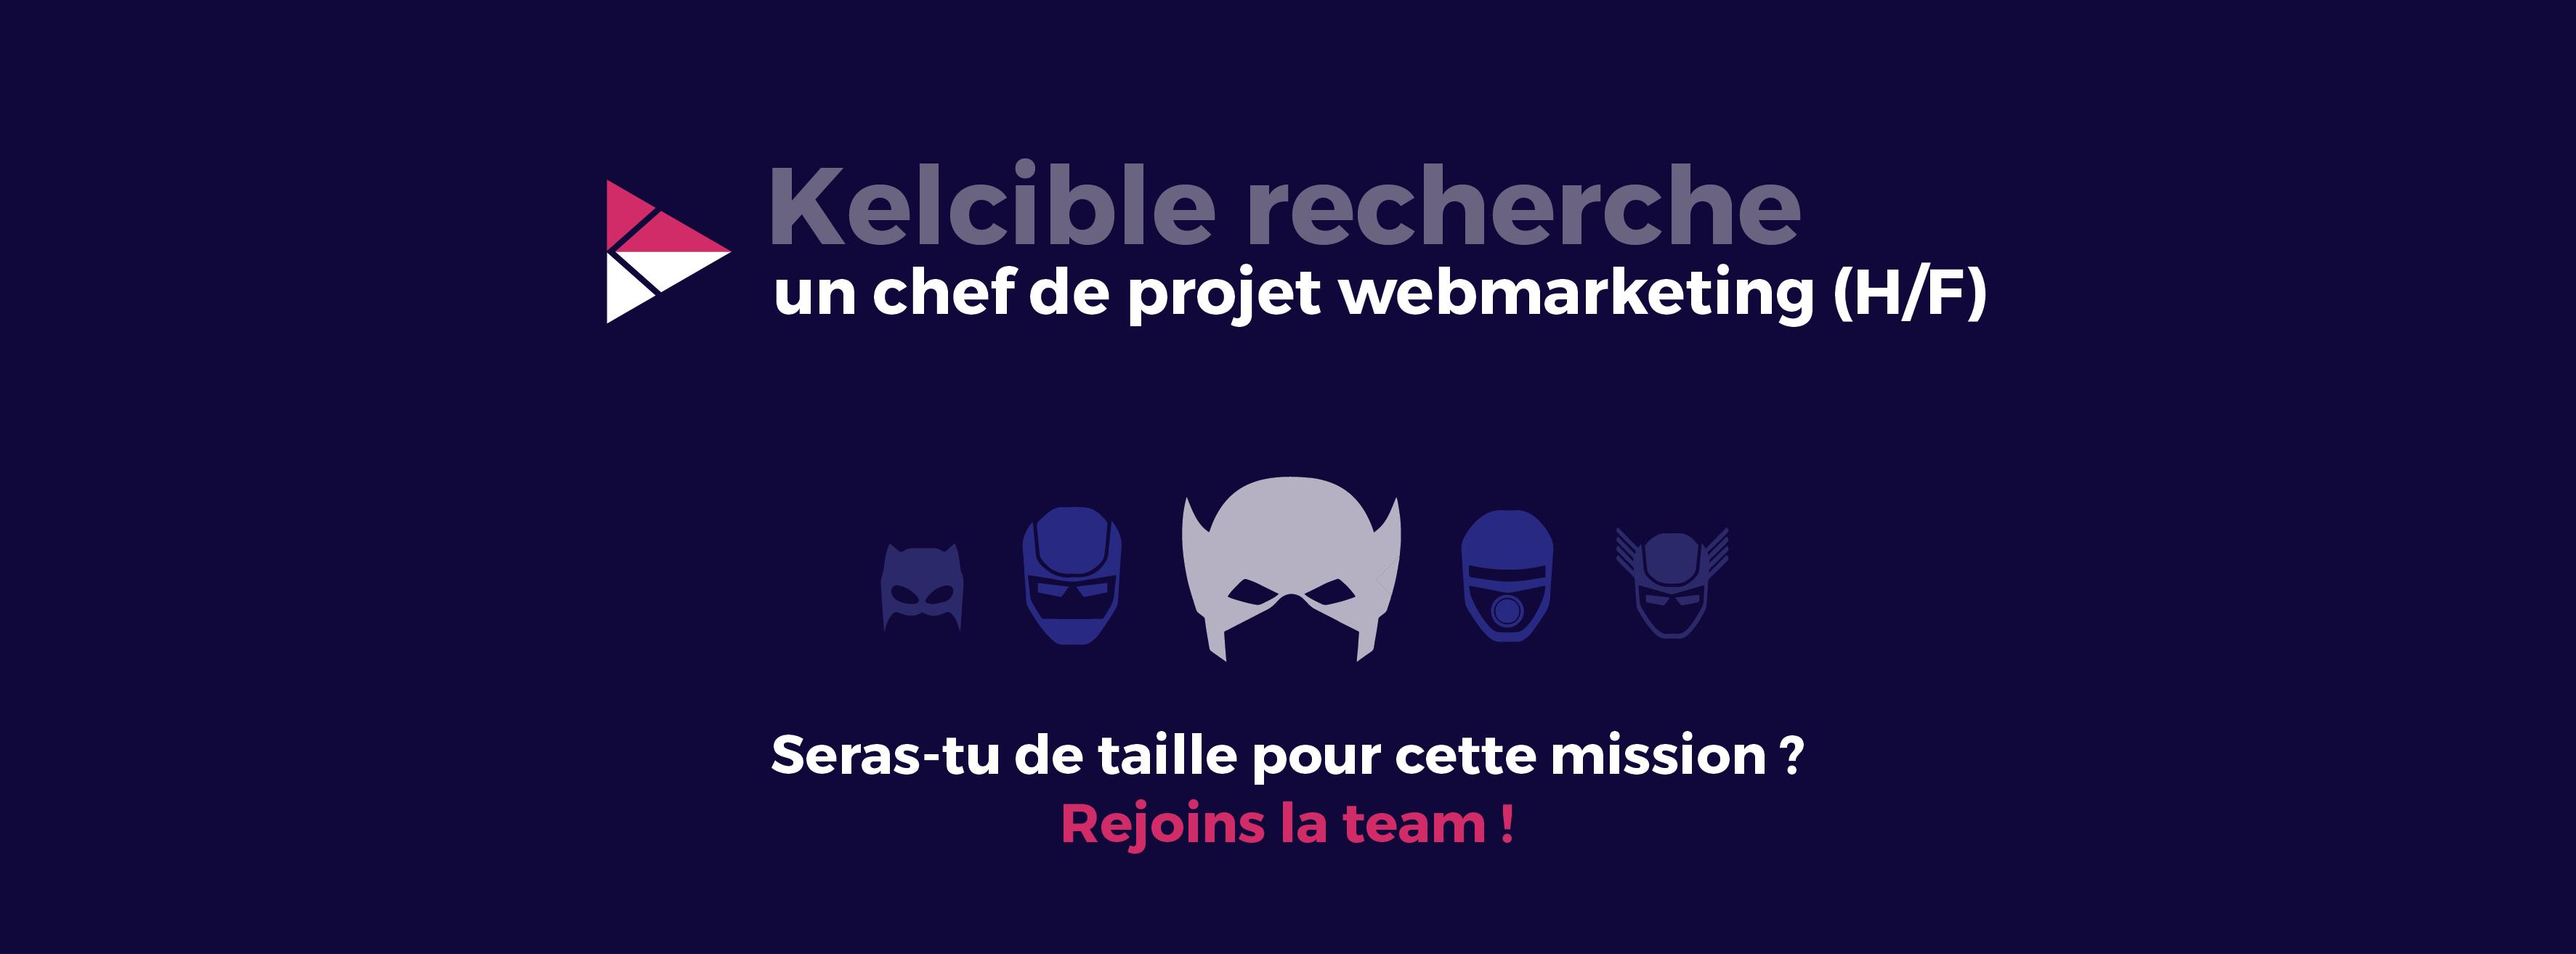 offre-chefwebmarketing-01